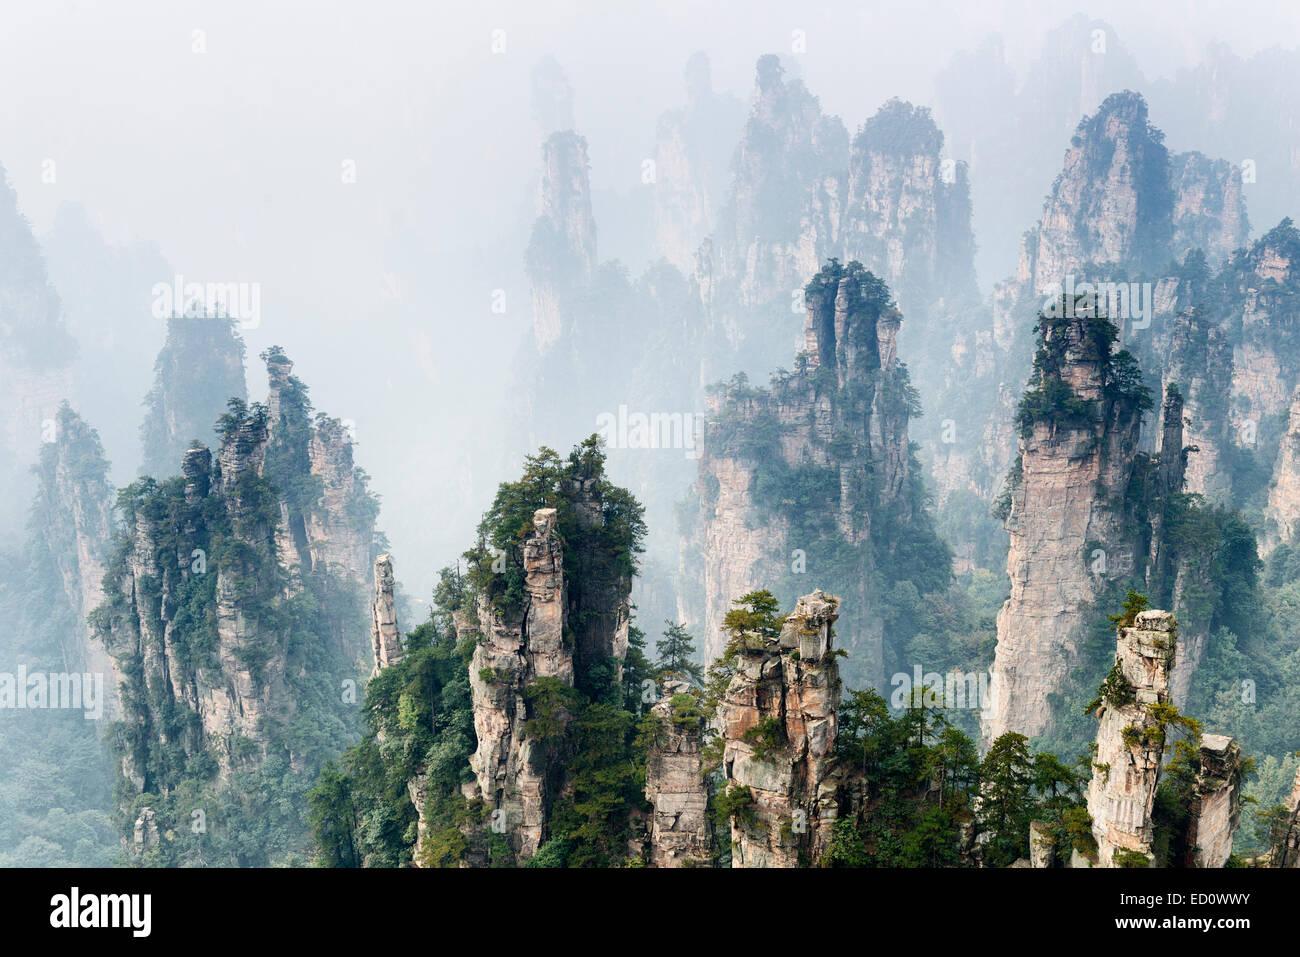 Mountain torres levantándose de la niebla en el Parque Forestal Nacional de Zhangjiajie Zhangjiajie, Hunan, Imagen De Stock